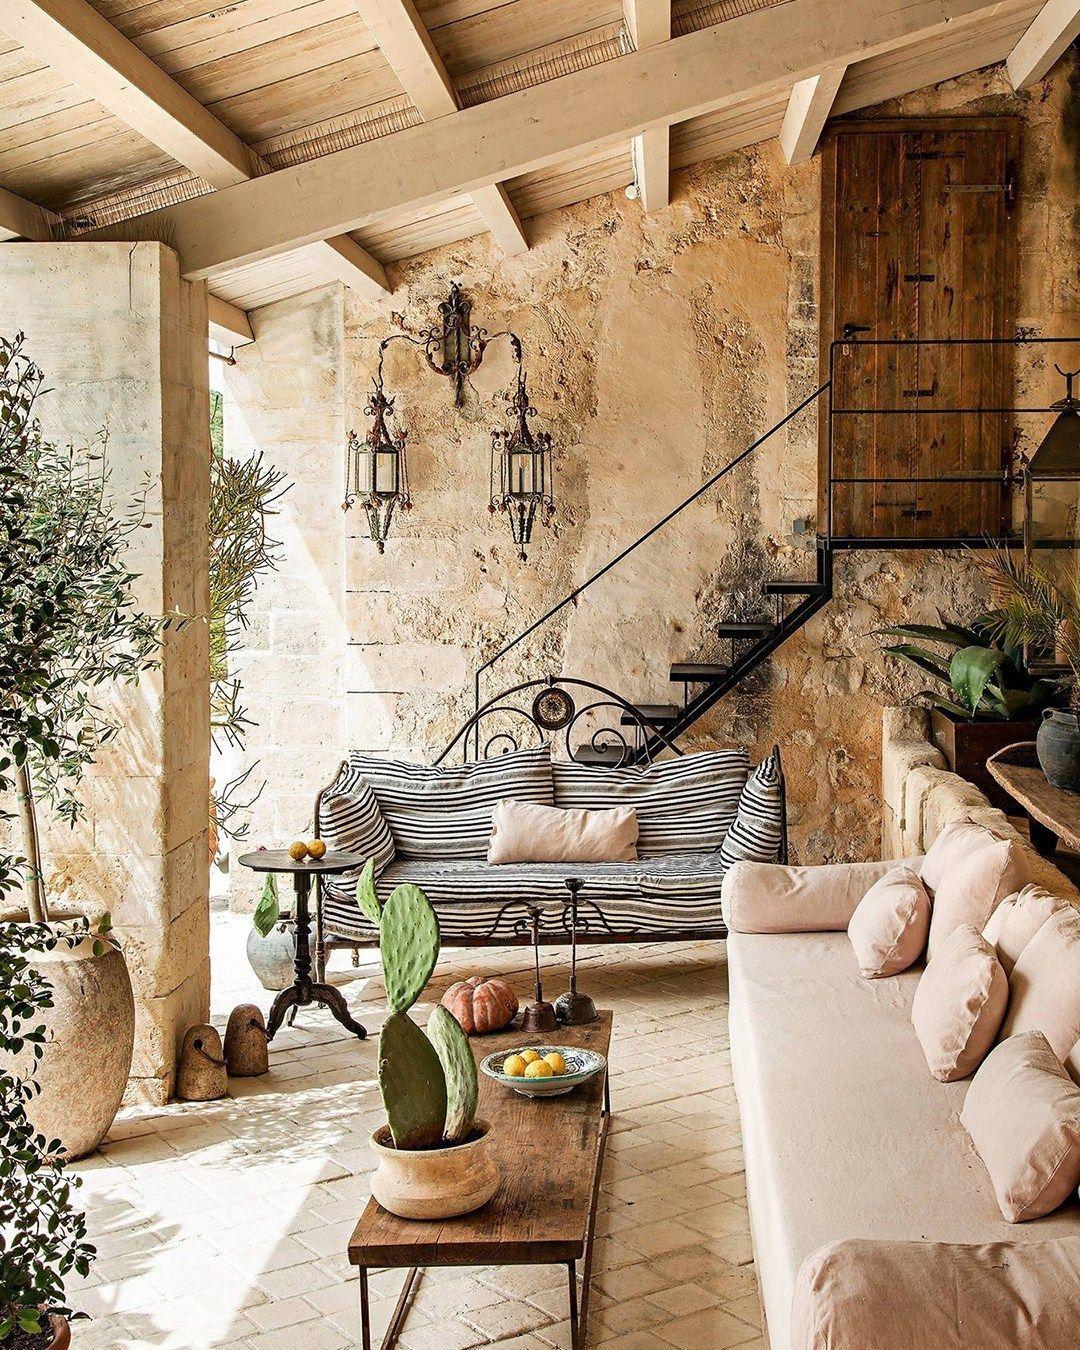 The Best Interiors on Instagram | Interior Design Inspiration